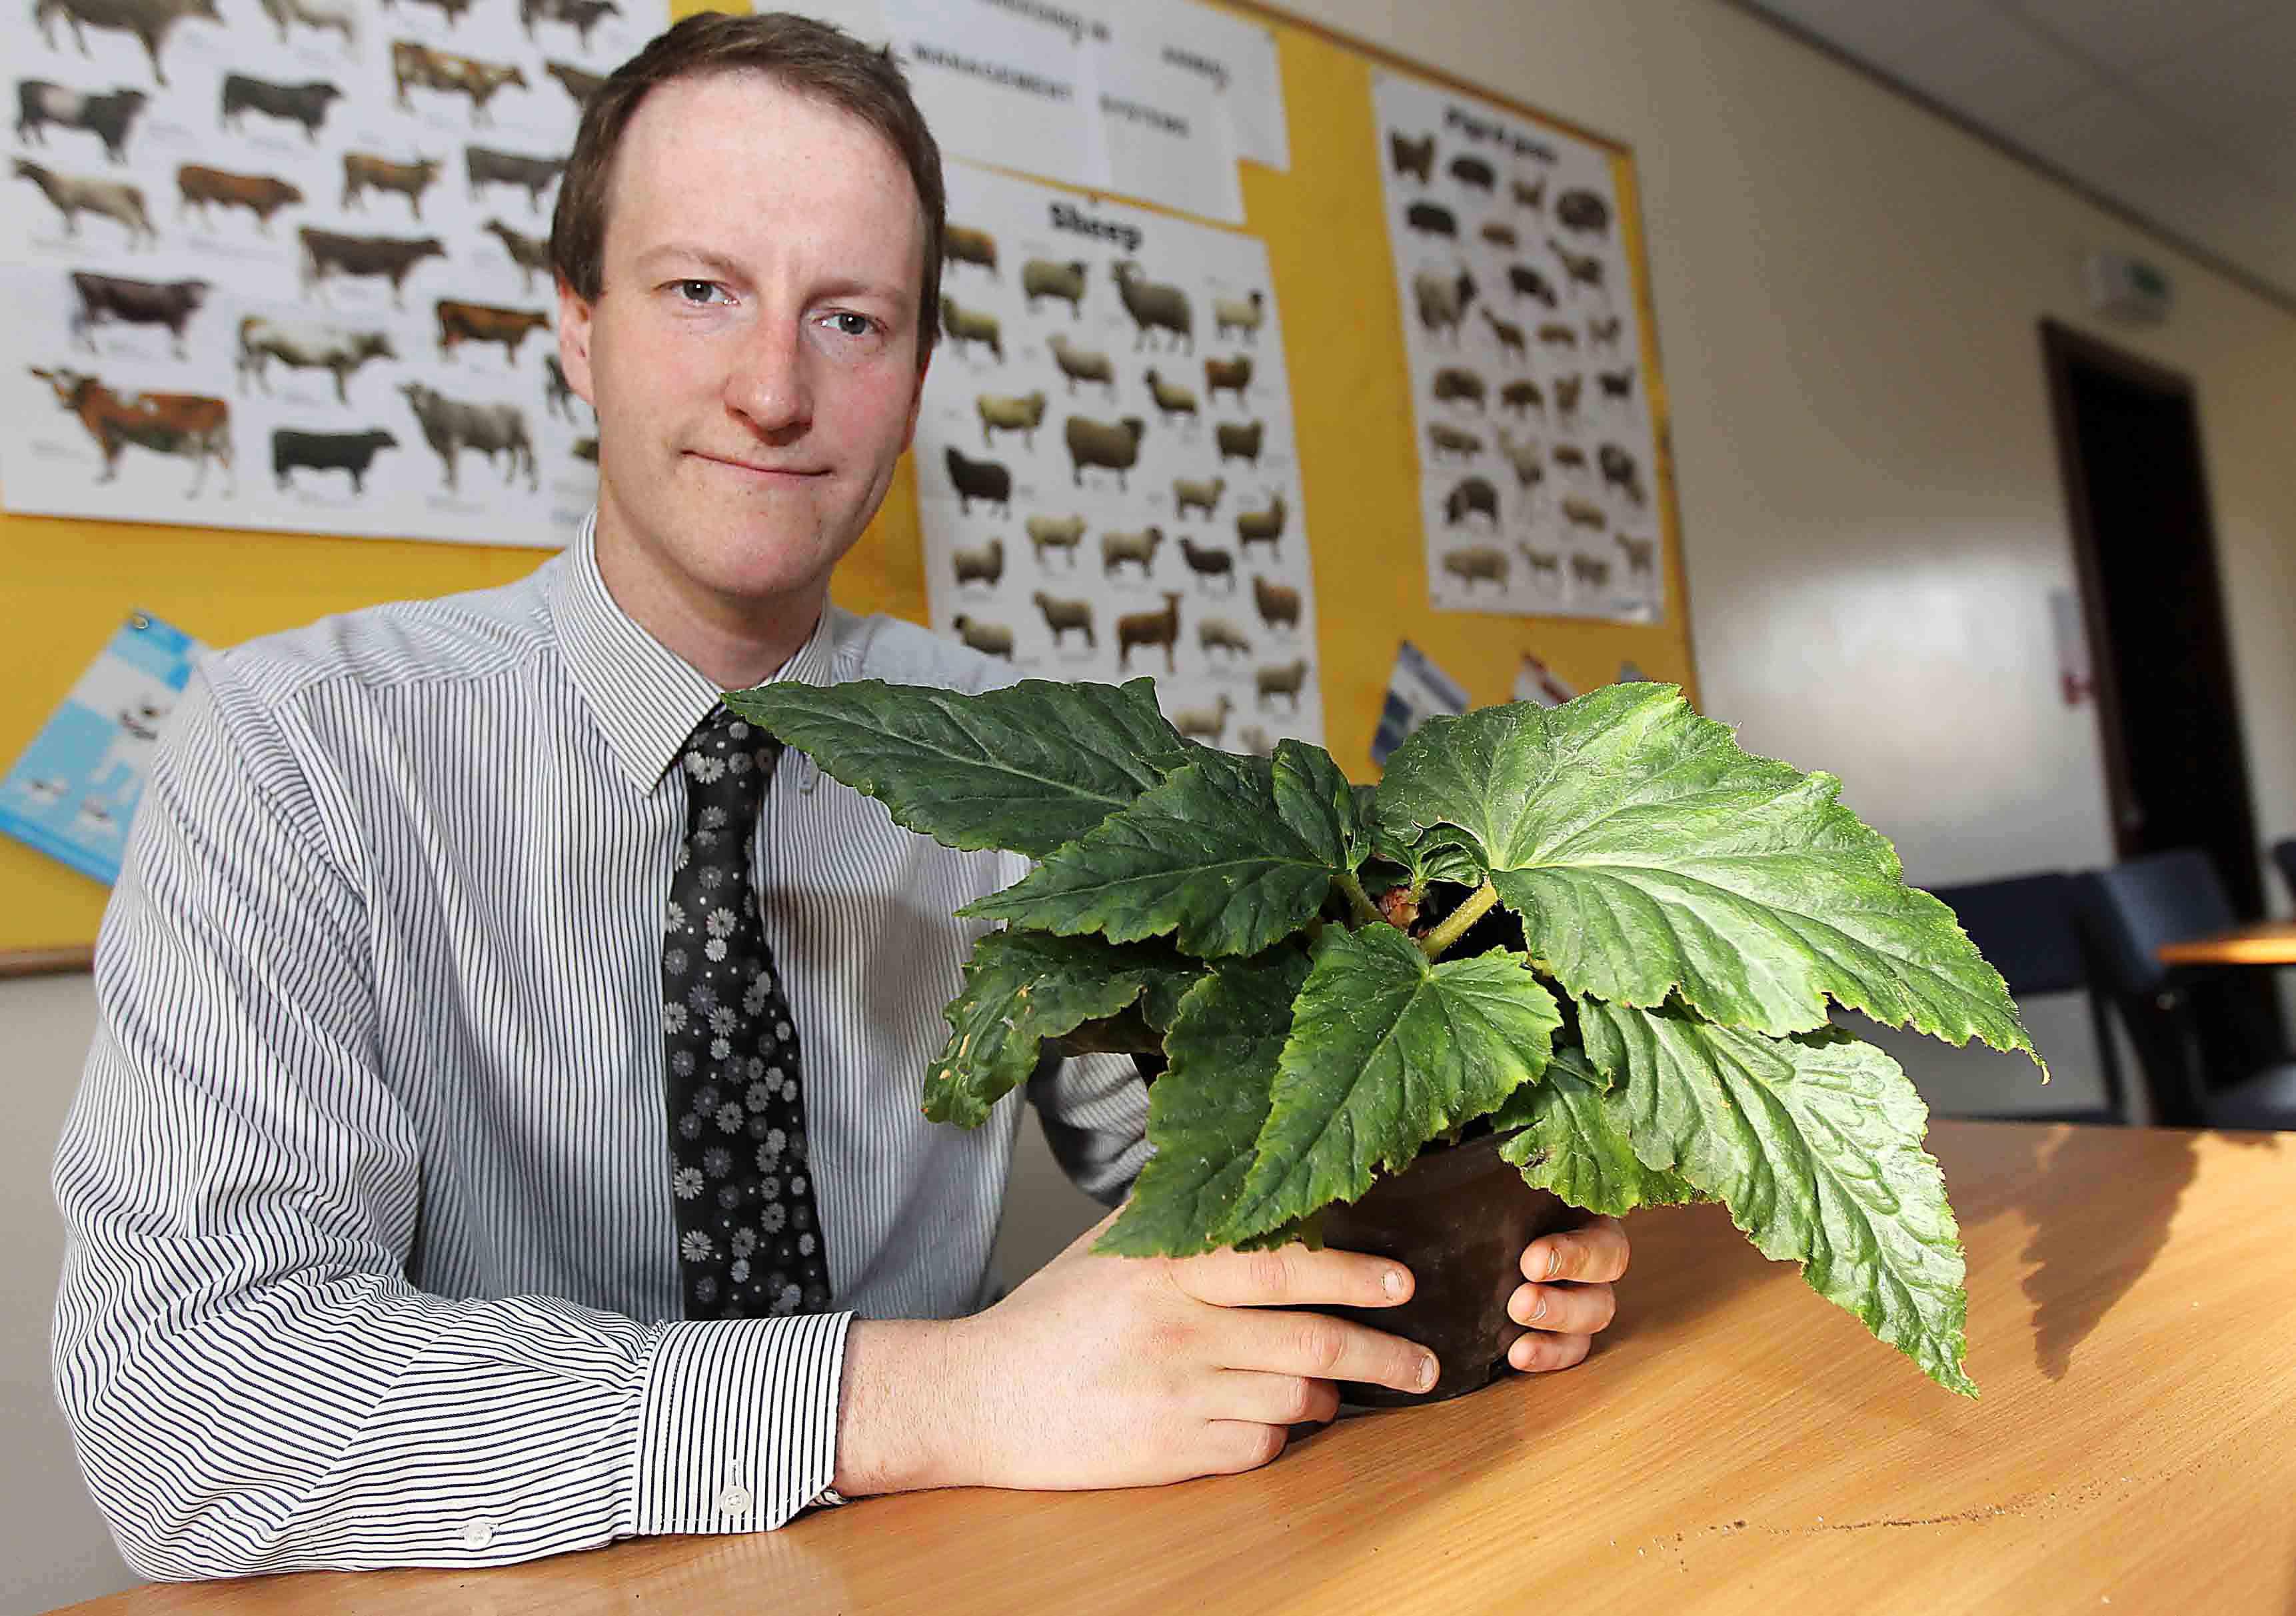 Ultra-rare plant, Kim Jong-il, lives in UK